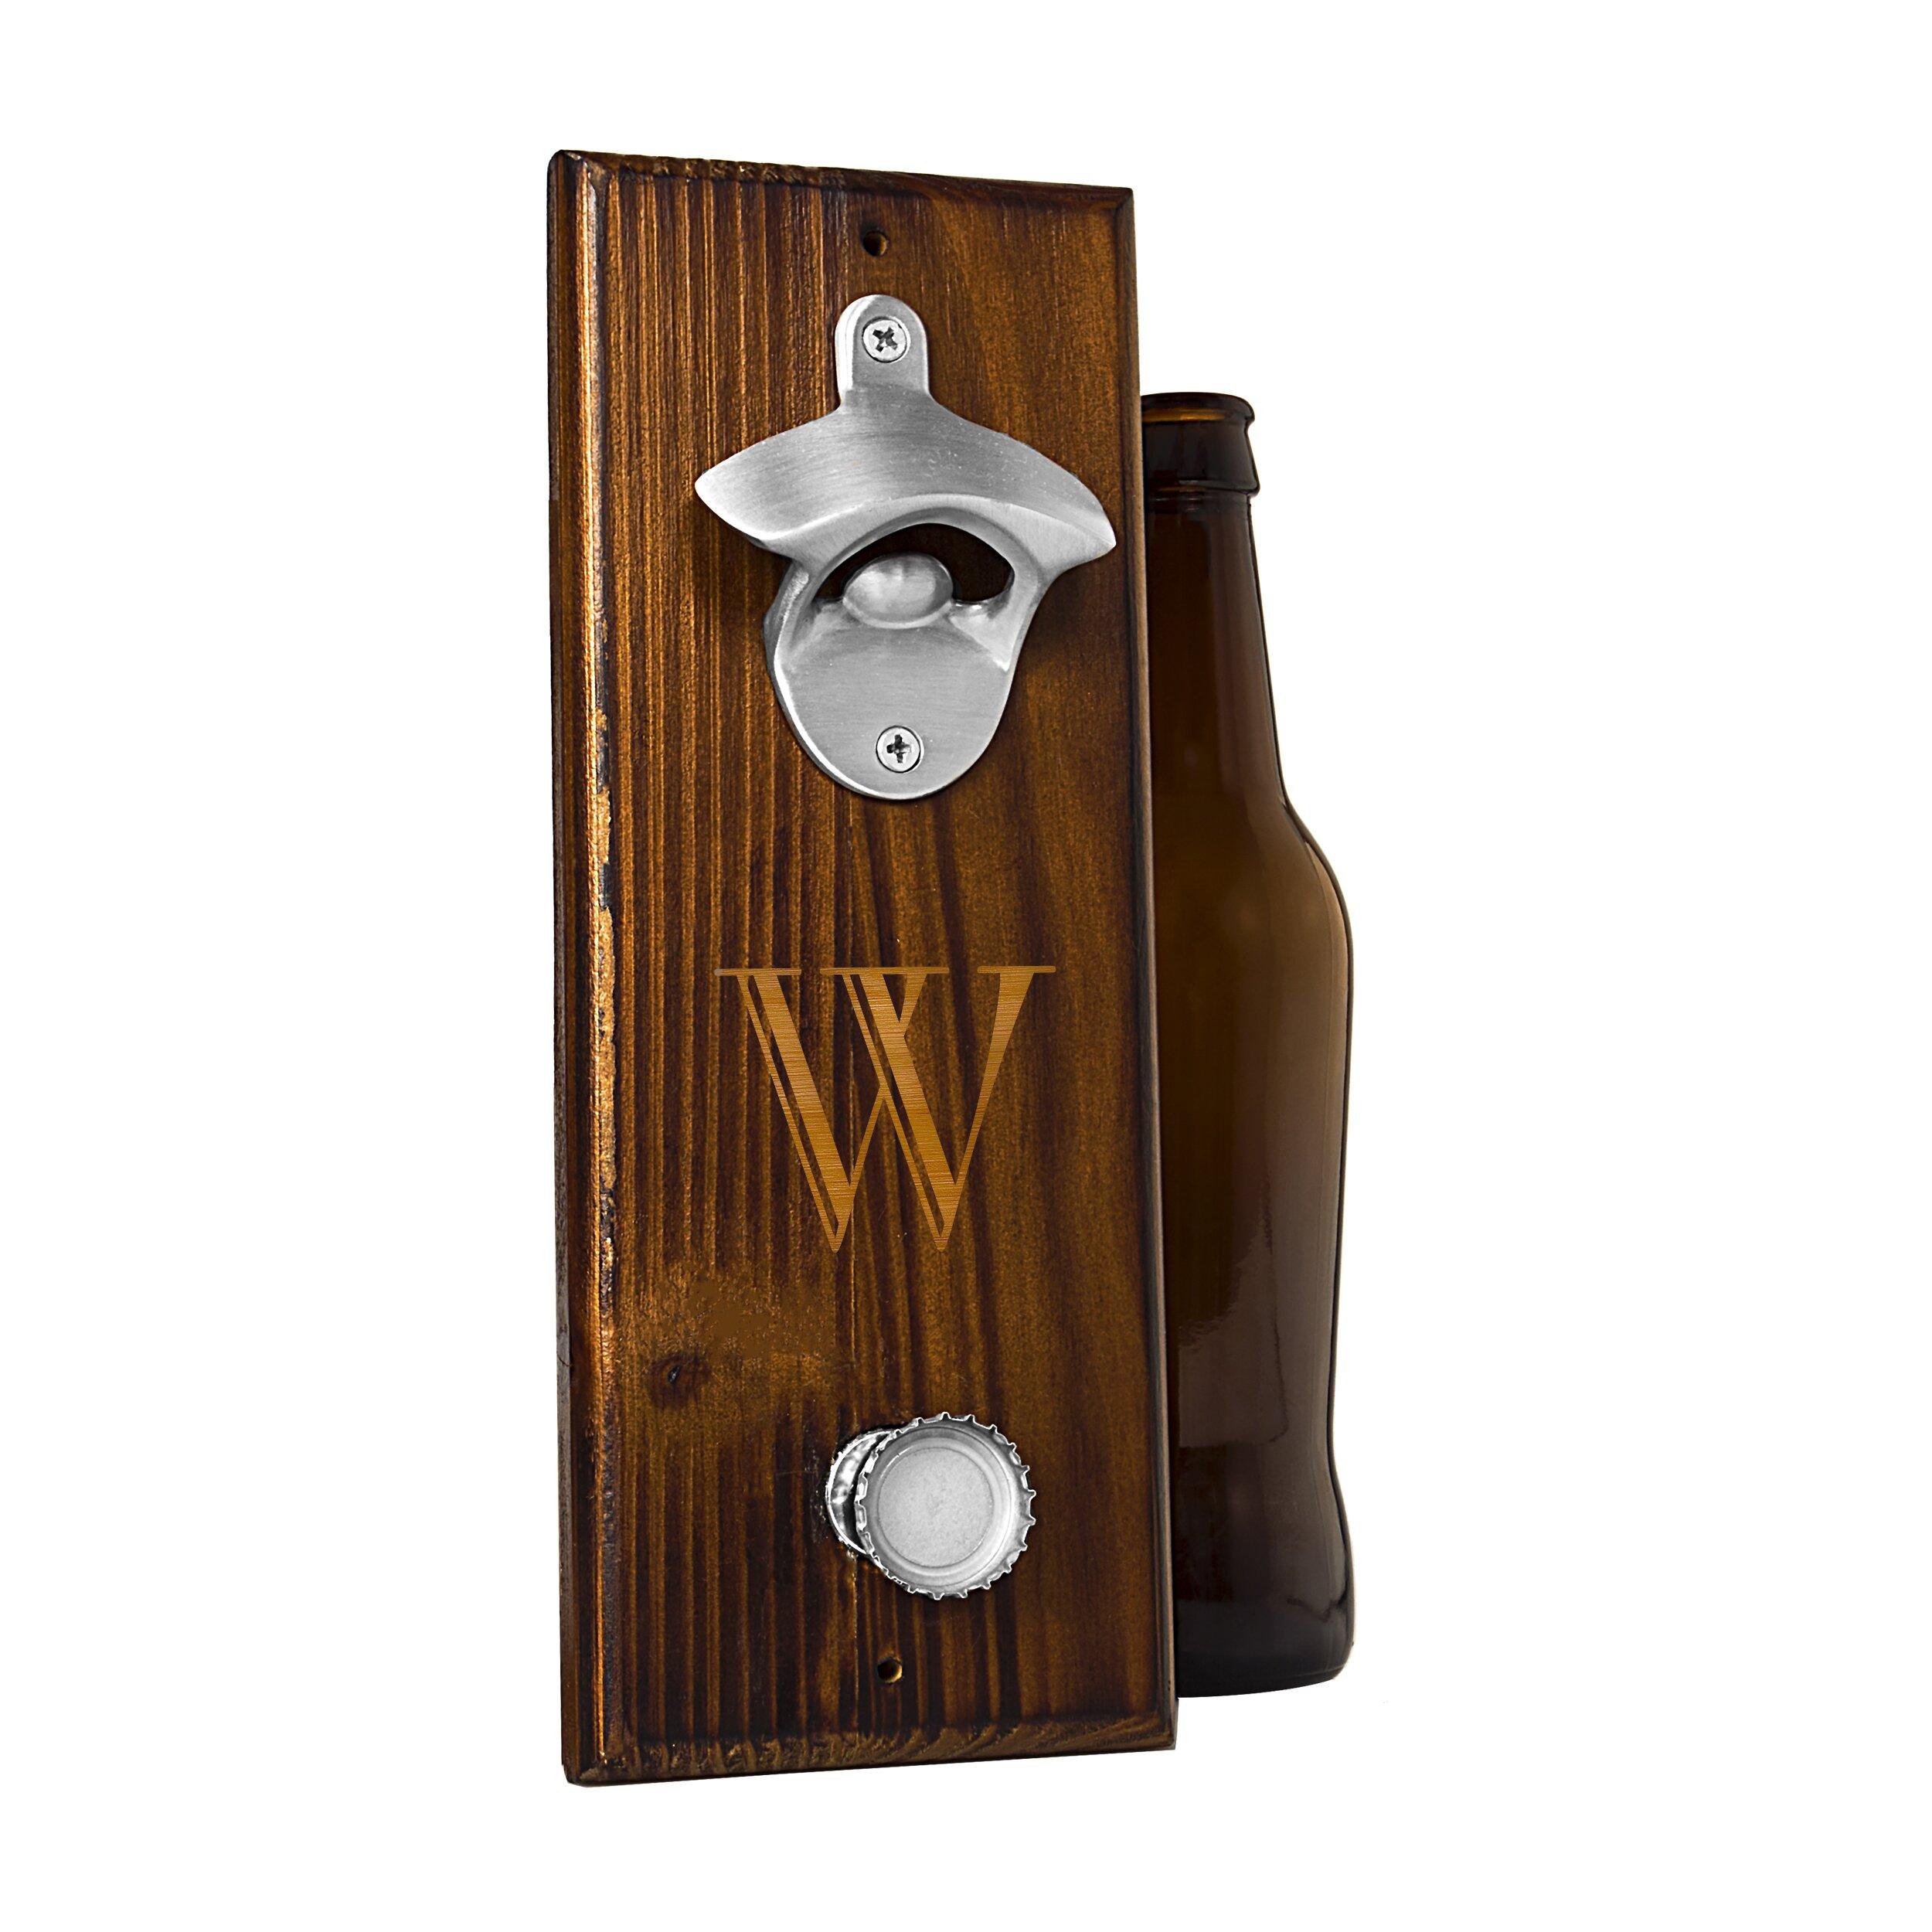 Personalized wall mount bottle opener wayfair - Personalized wall mount bottle opener ...